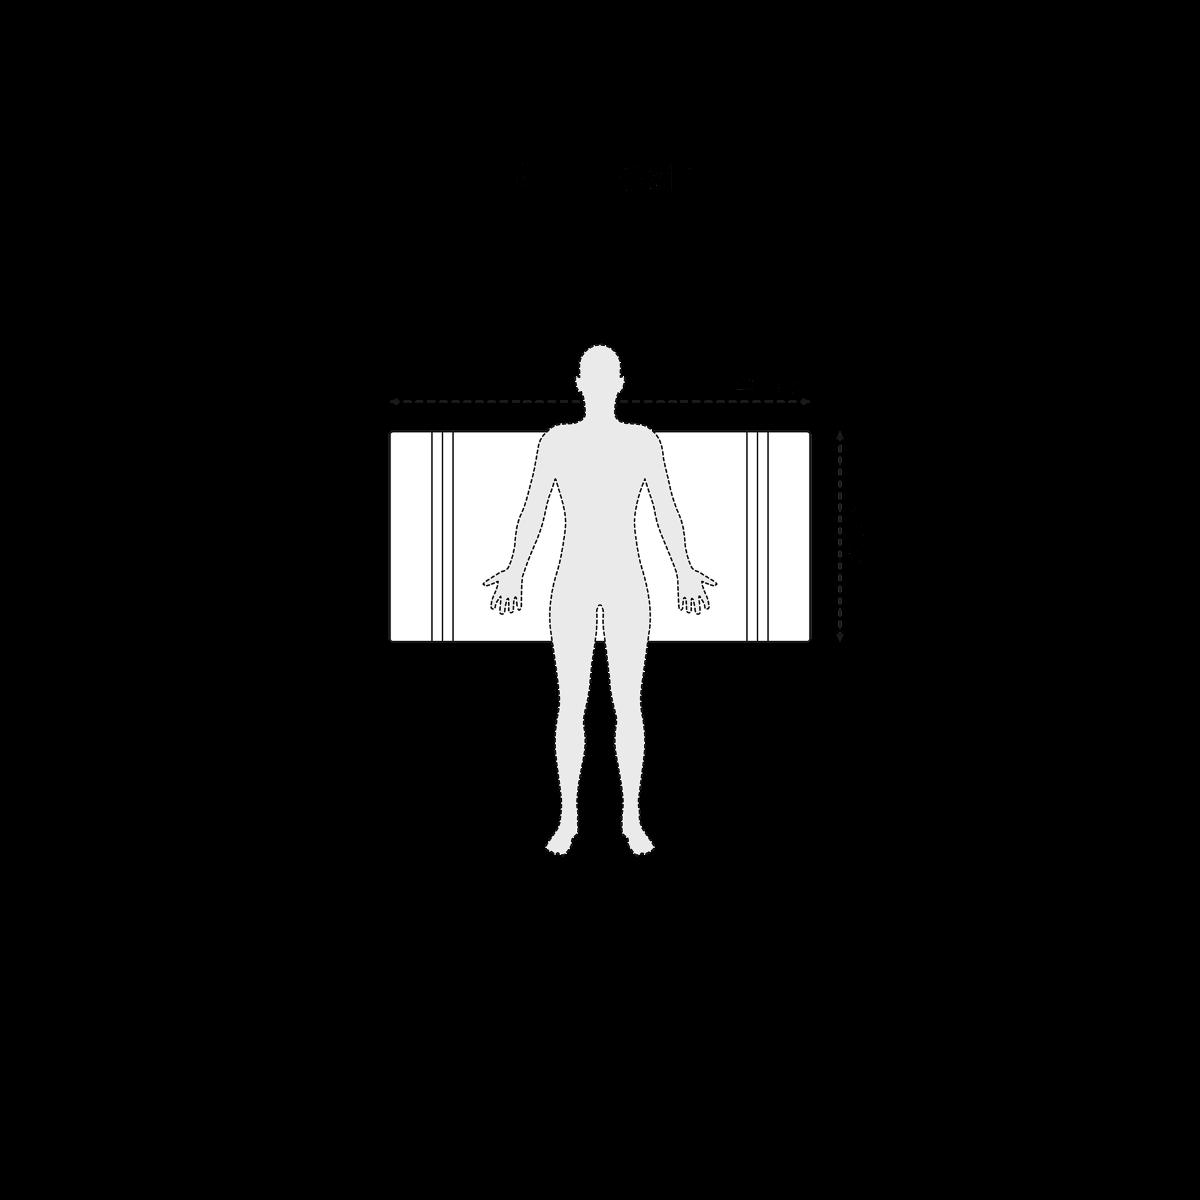 Bath Towel Dimensions